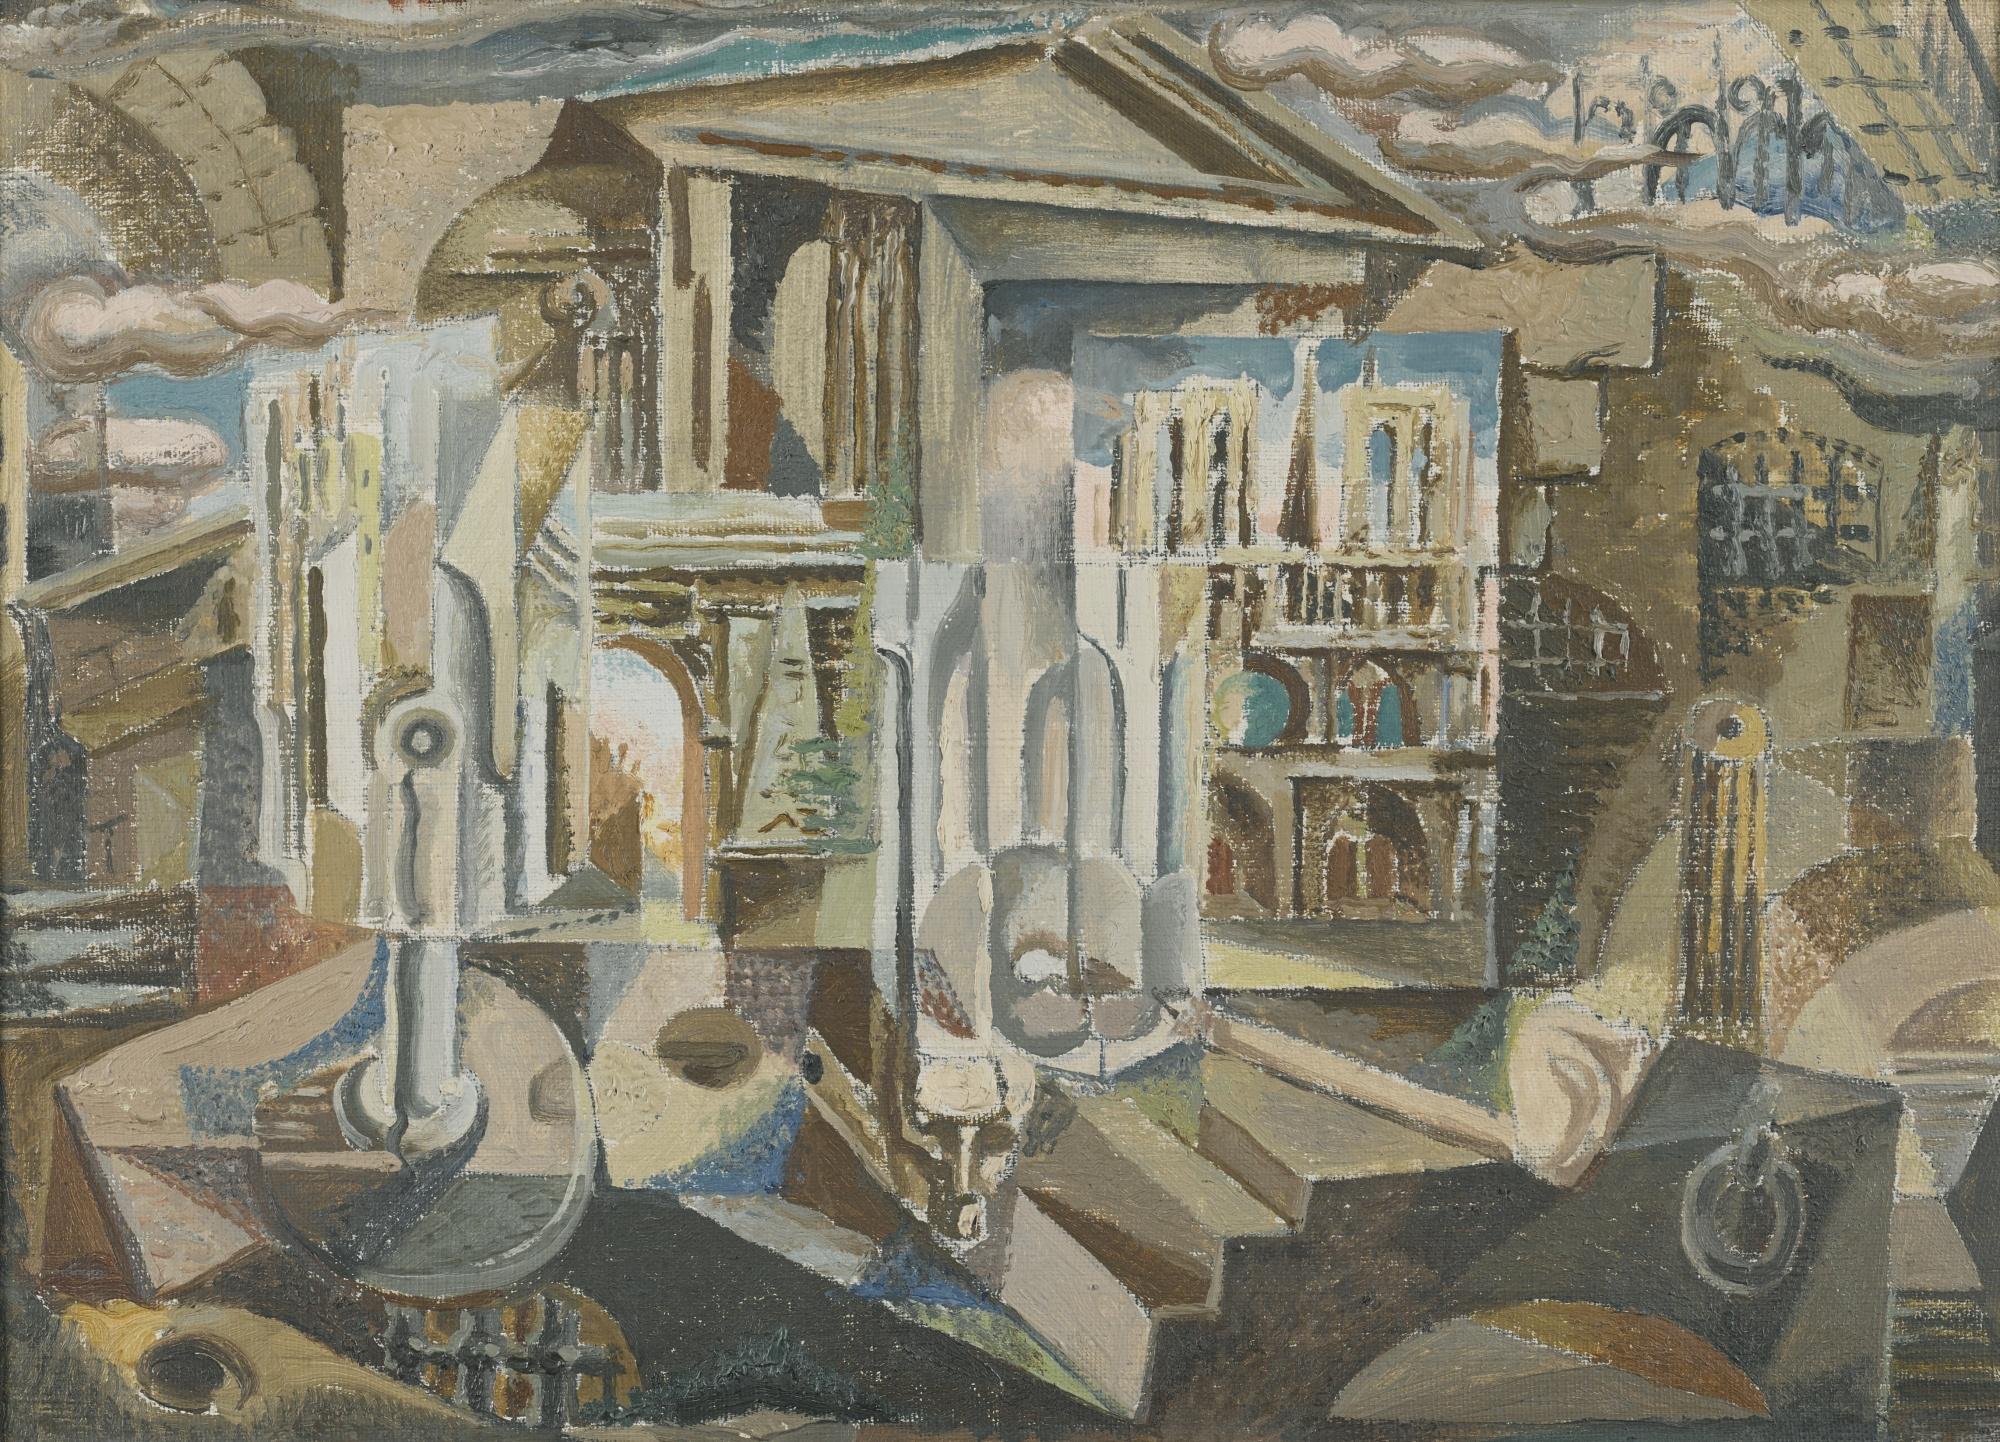 Andre Masson-Les Cartes Postales-1925